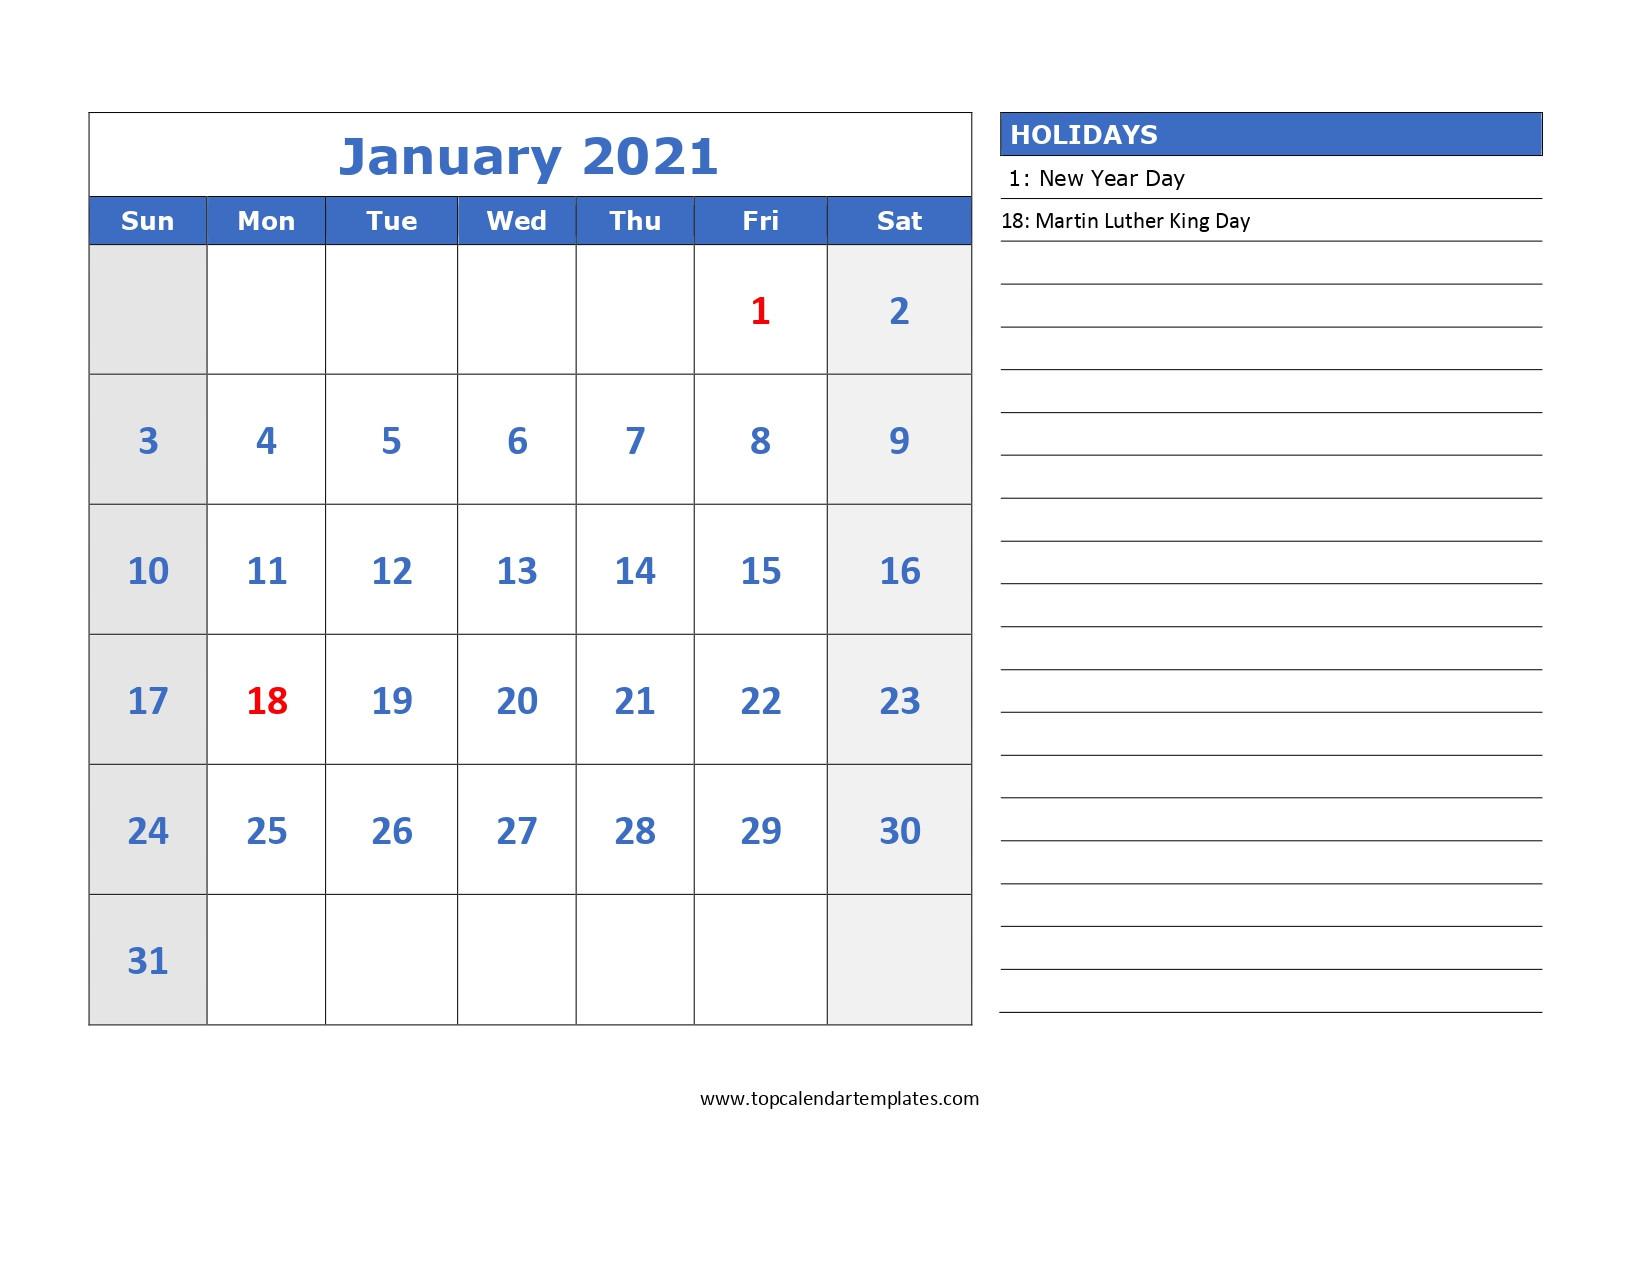 Free Blank Calendar 2021 Printable | Free Letter Templates-2021 Calendar Squares To Rpint